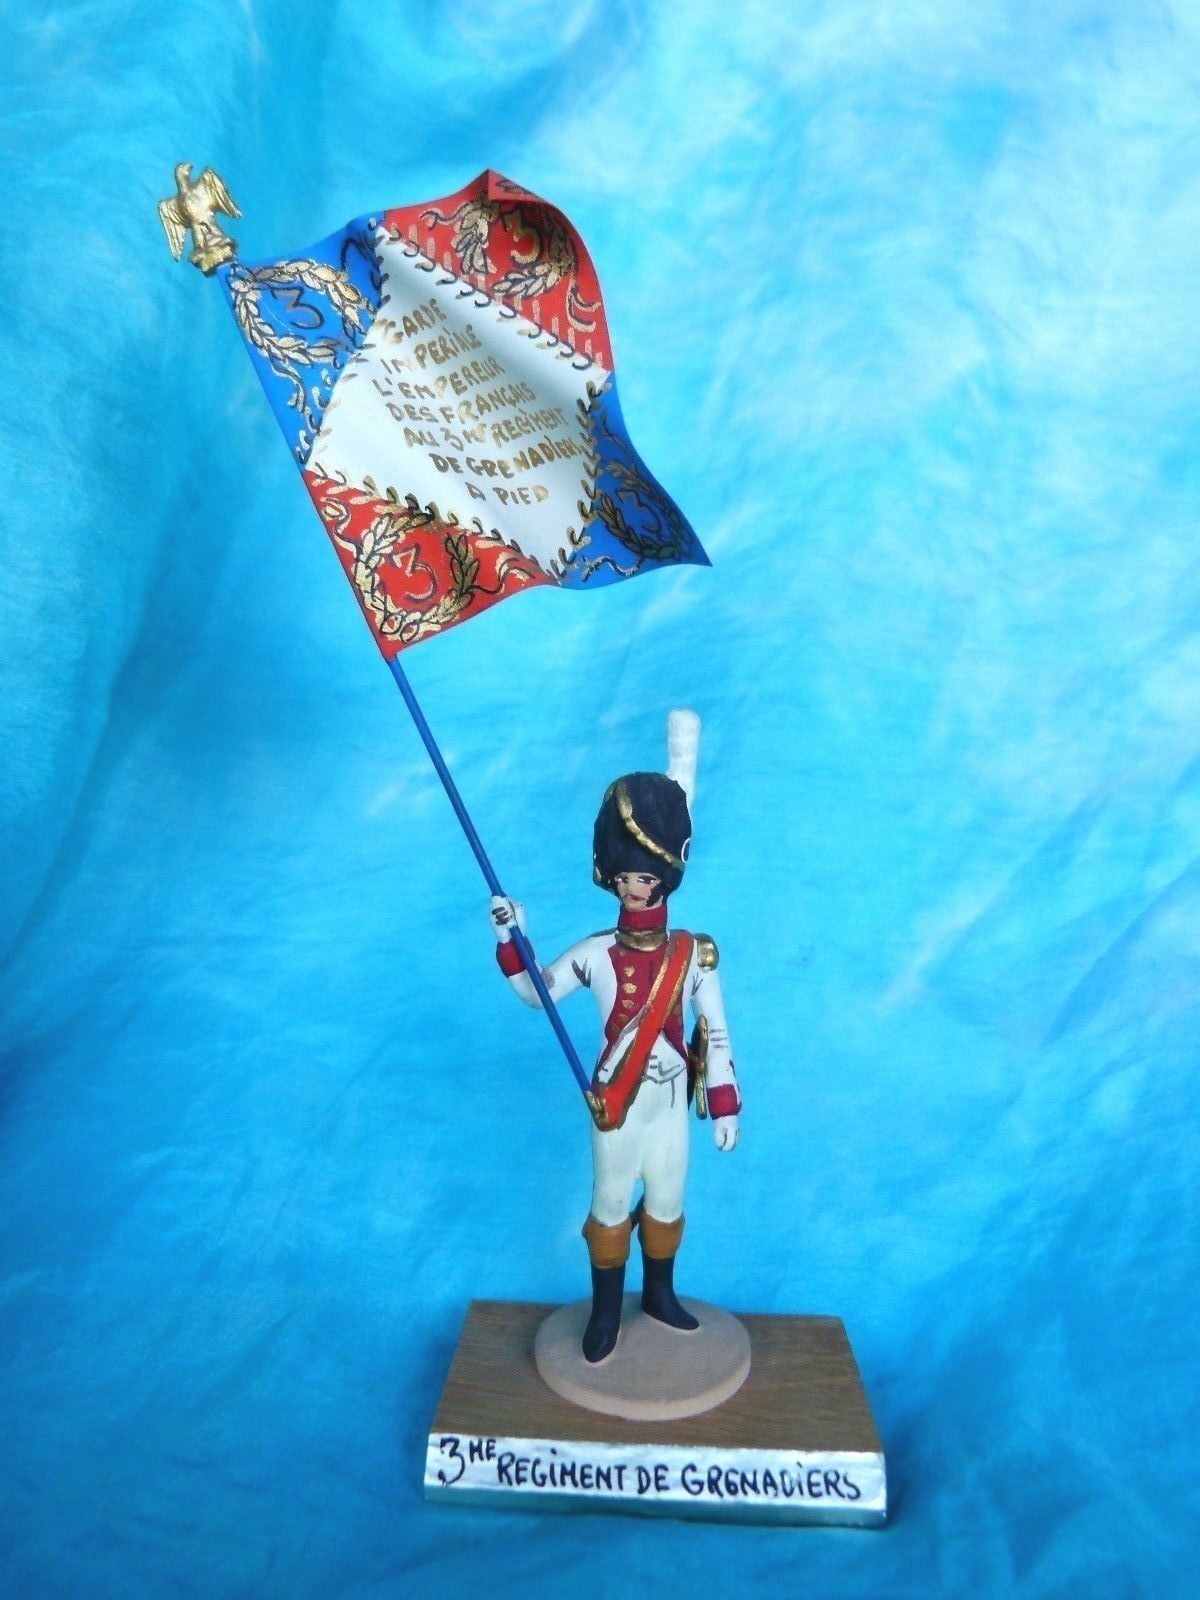 Porte drapeau 1er empire Guy Renaud - 3eme régiment de grenadiers - Flag bearer